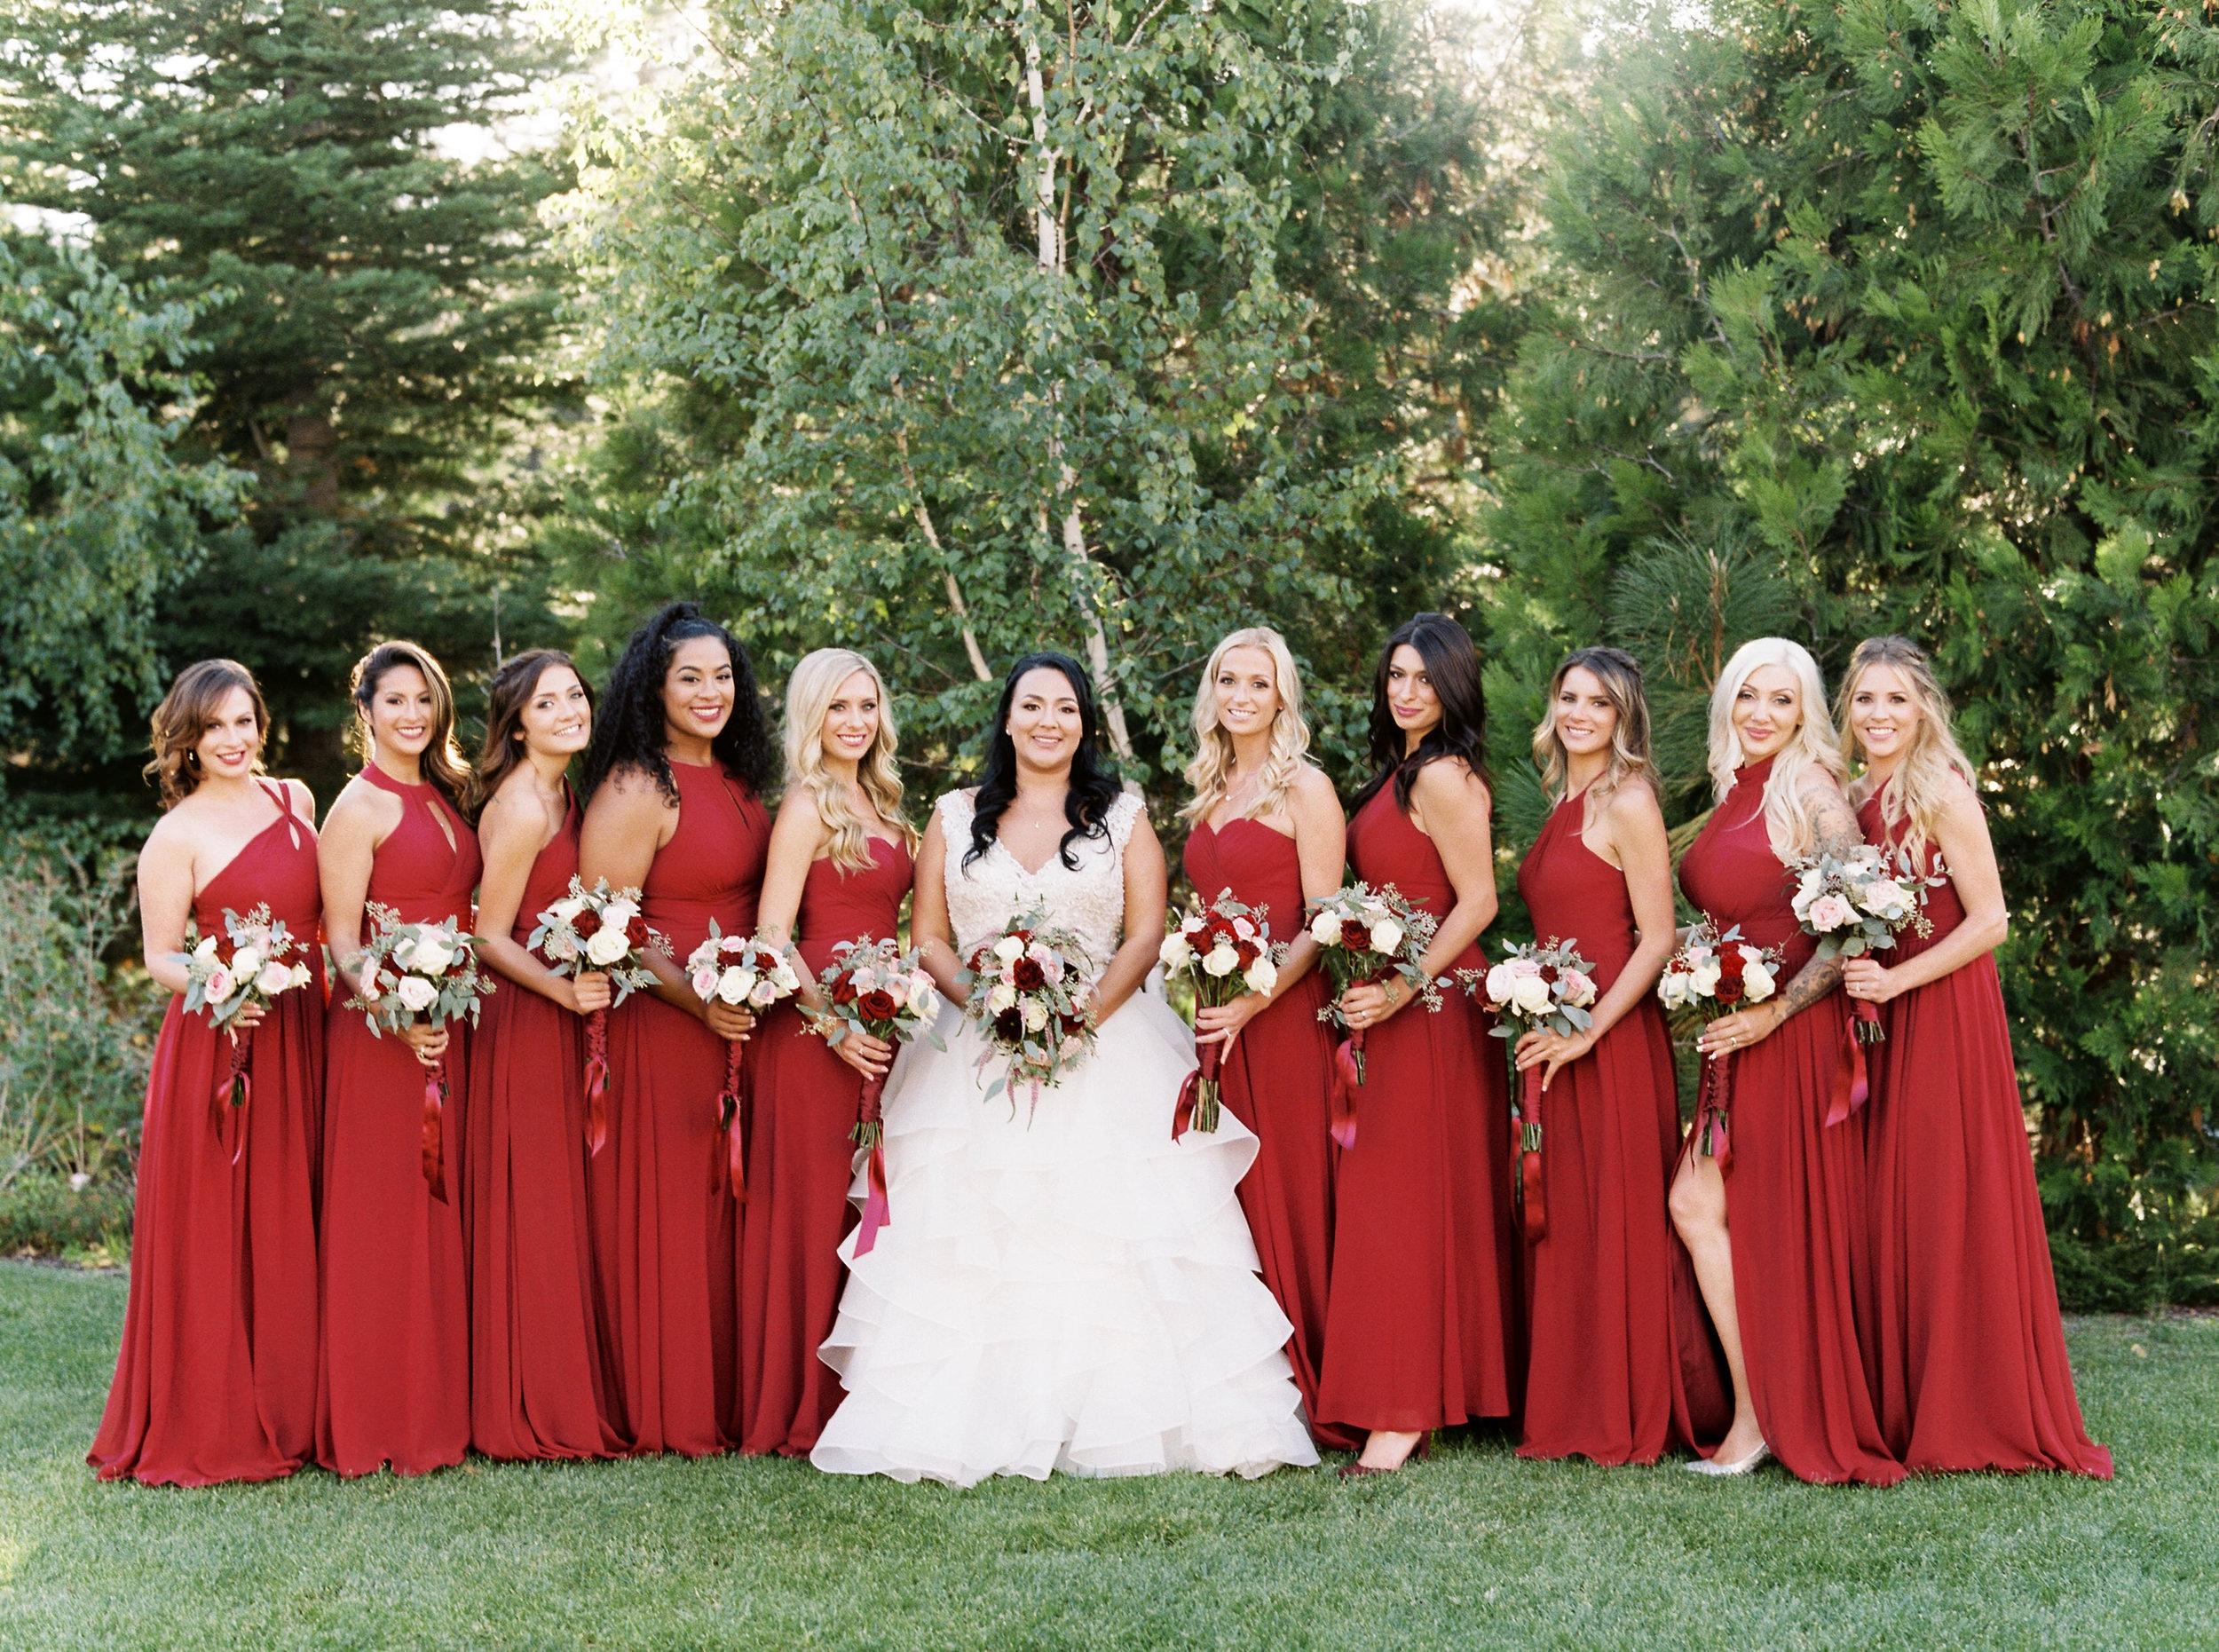 Tenaya-lodge-wedding-at-yosemite-national-park-california-36.jpg